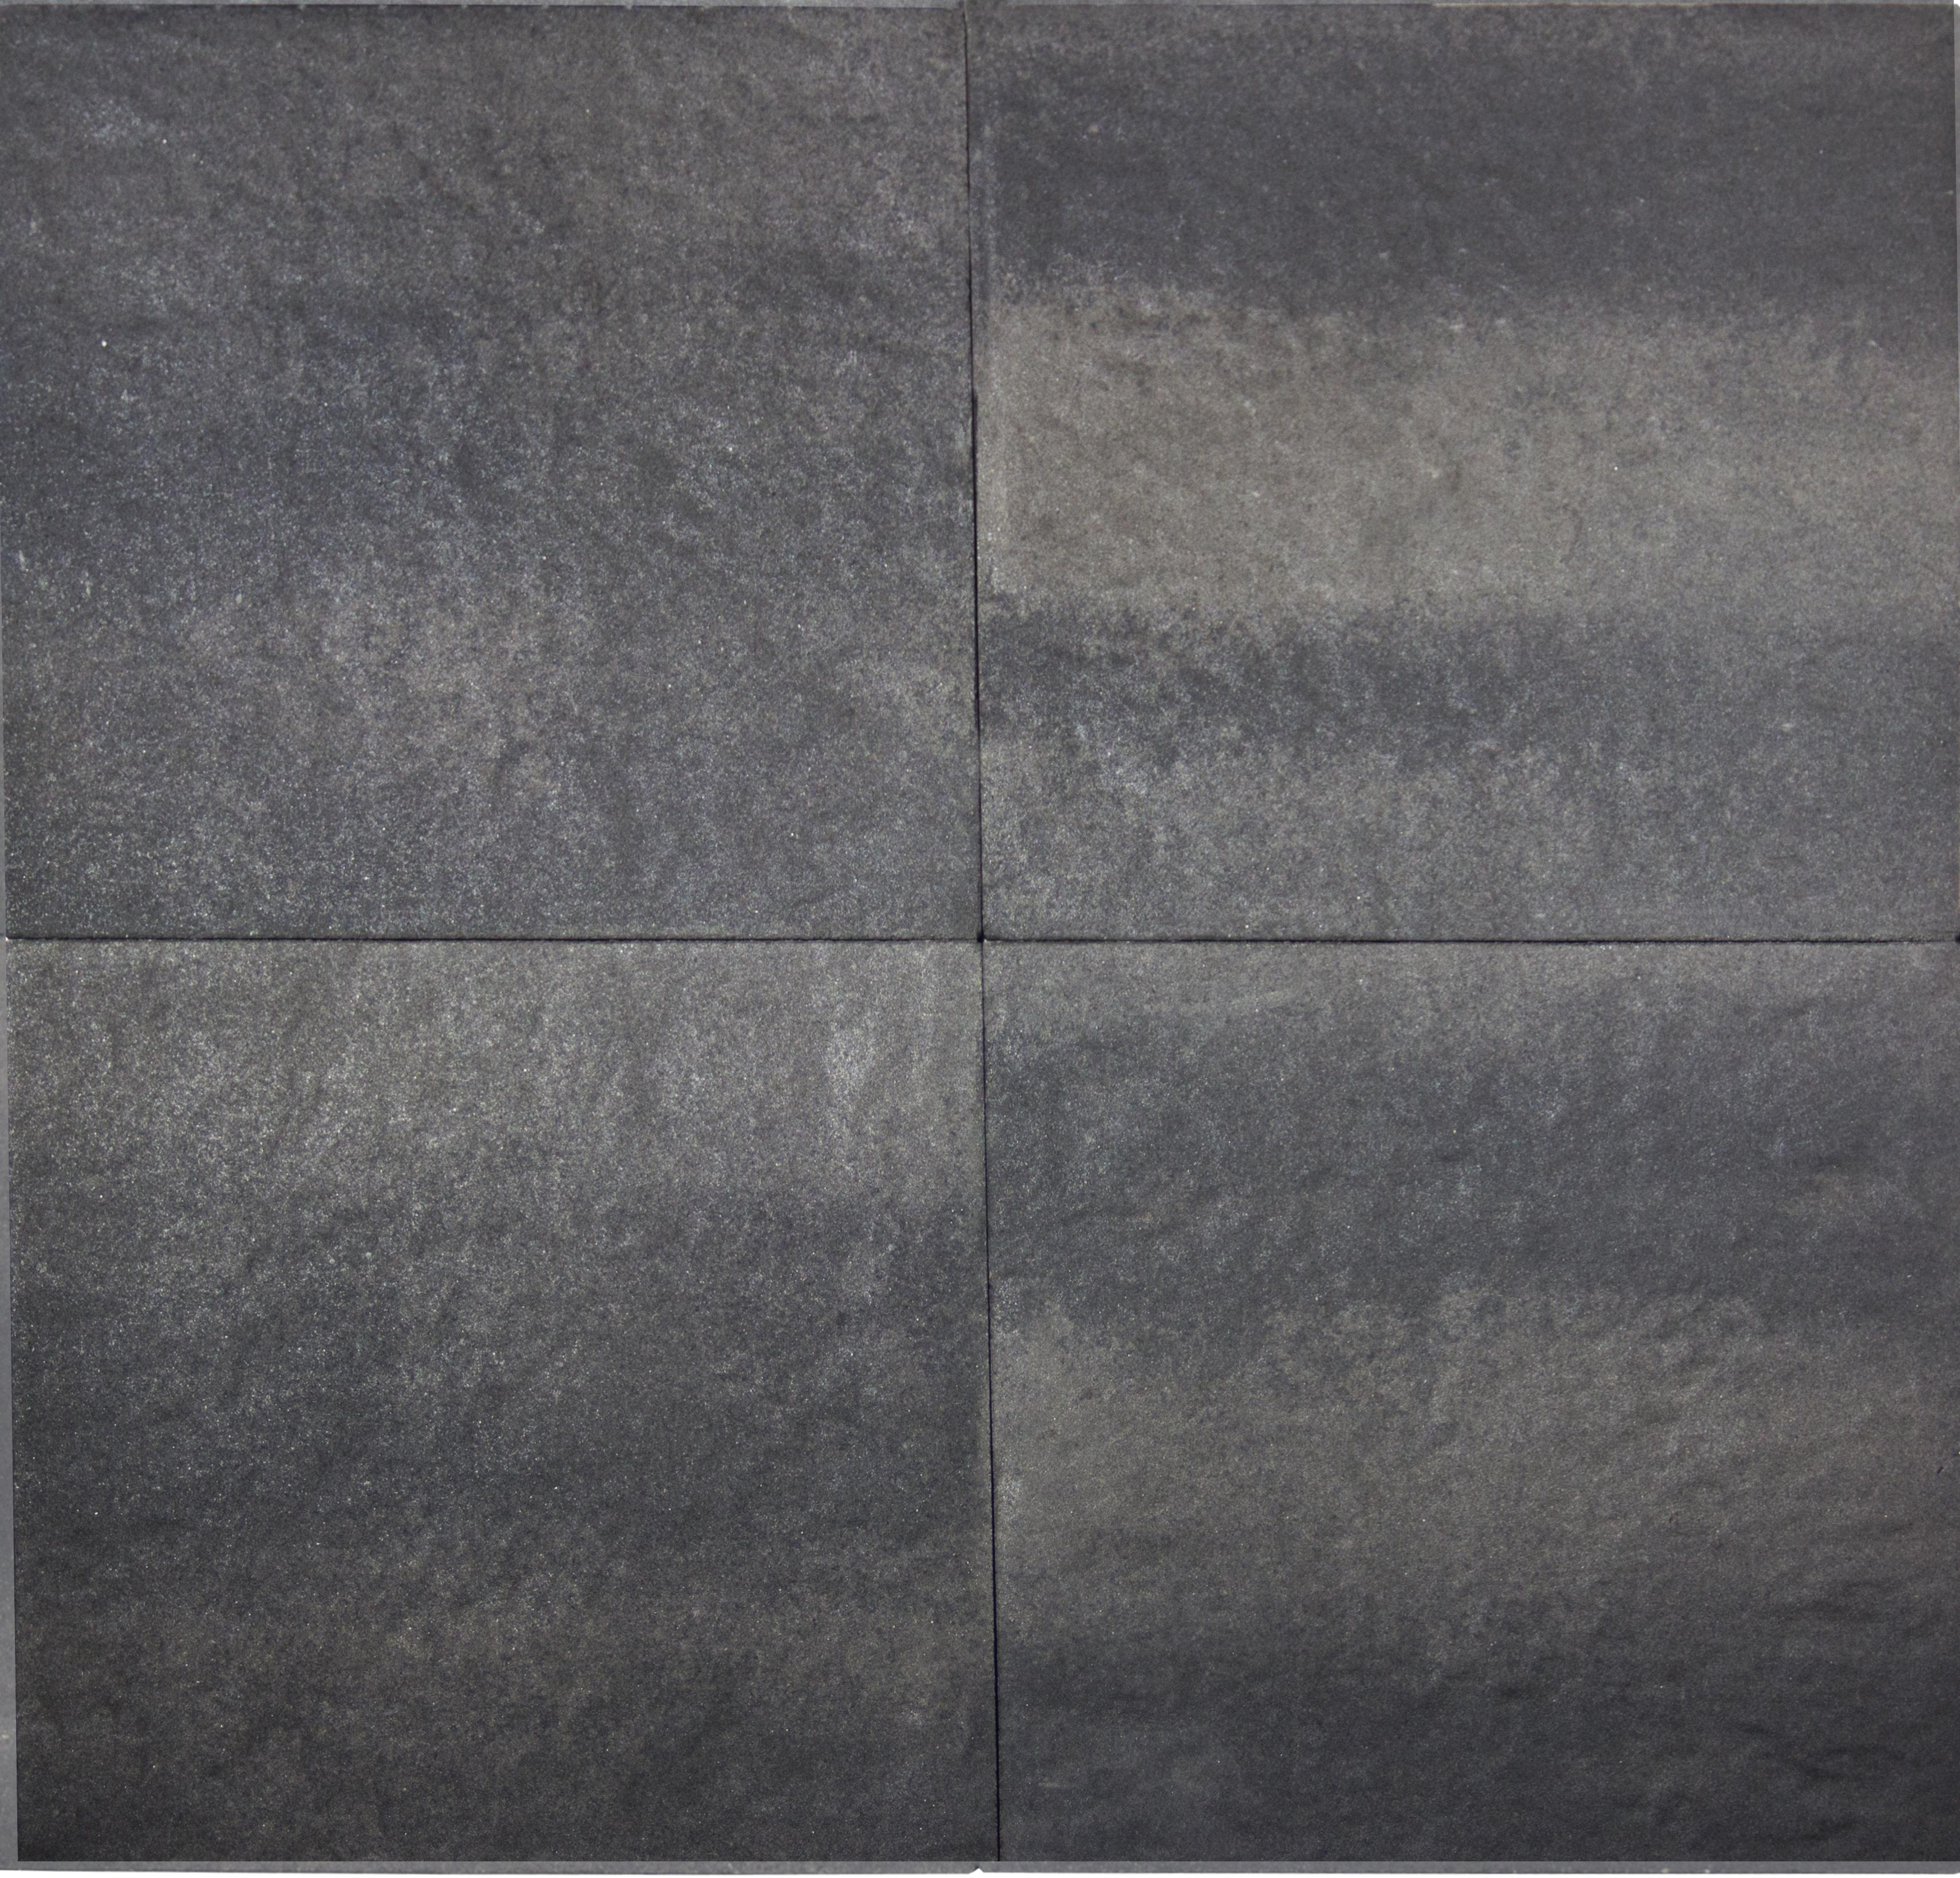 MBI | Venta Tops Accionata 60x60x4.7 | Greyblack